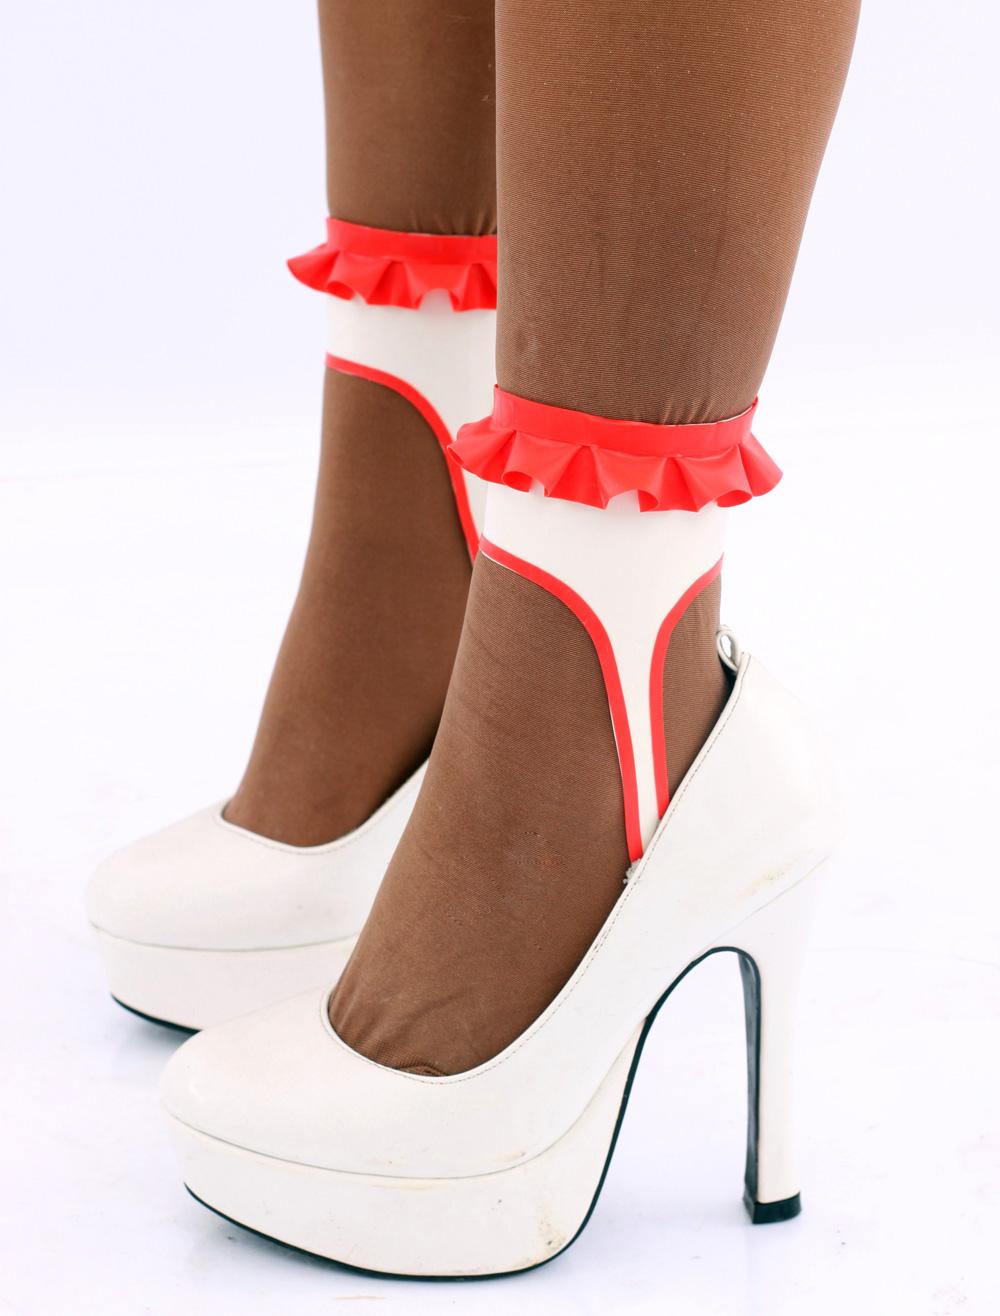 Red White Latex Stockings